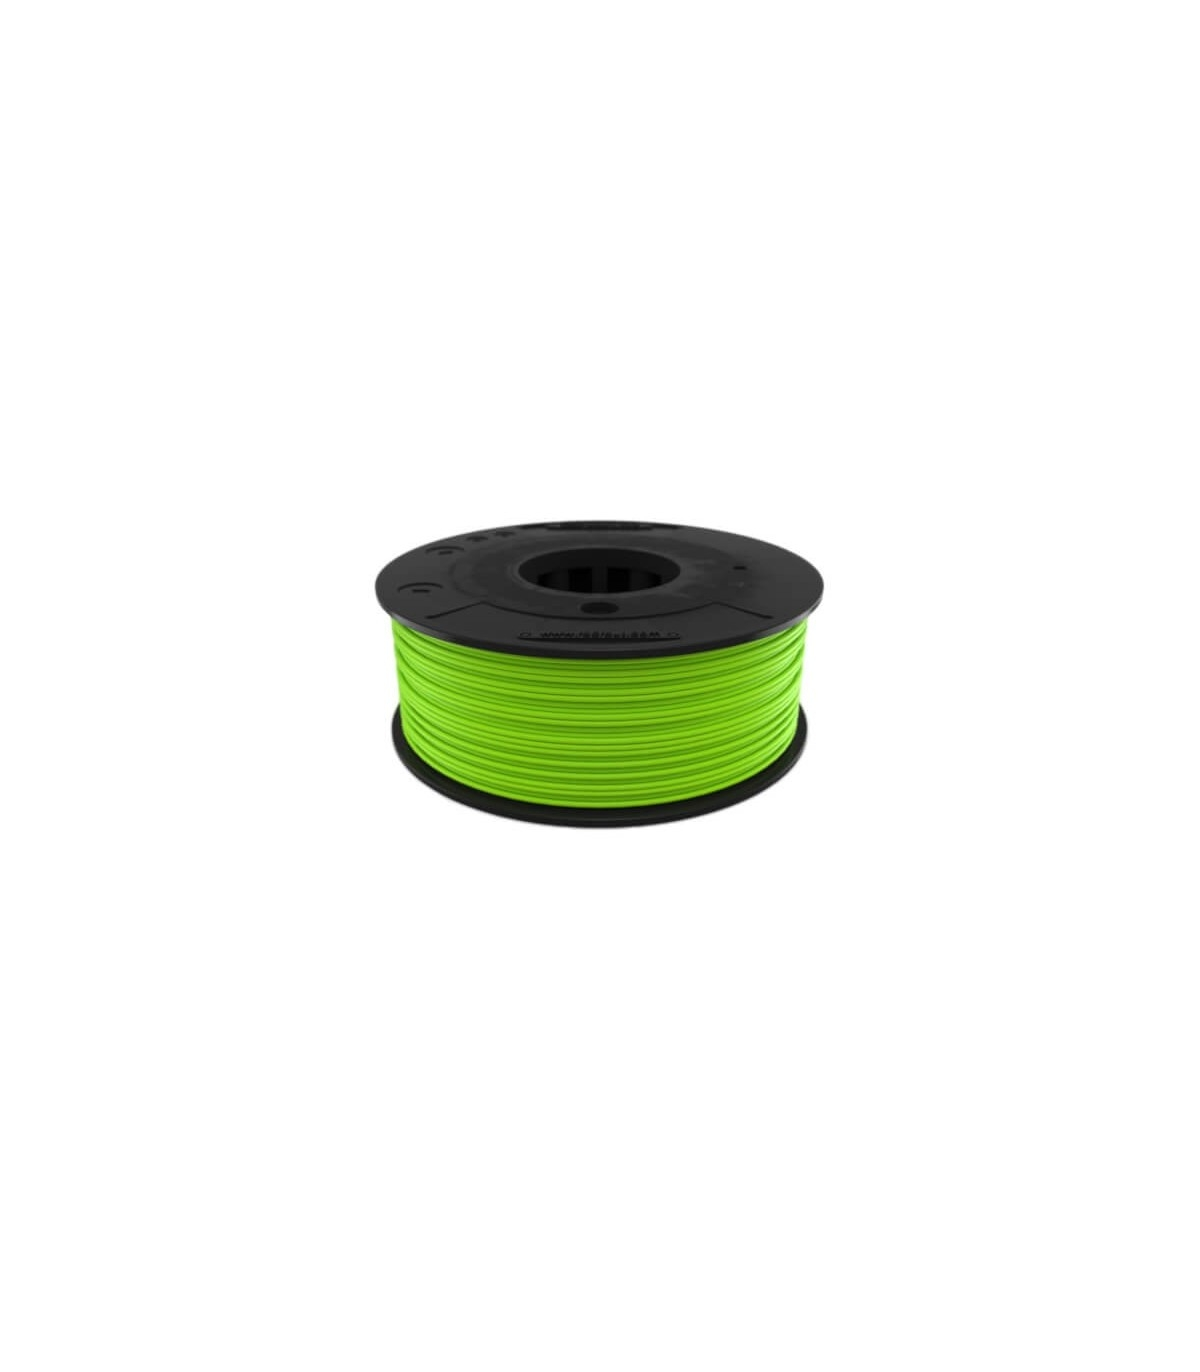 FilaFlex  Green 82A TPE Filament 2.85 mm 250g